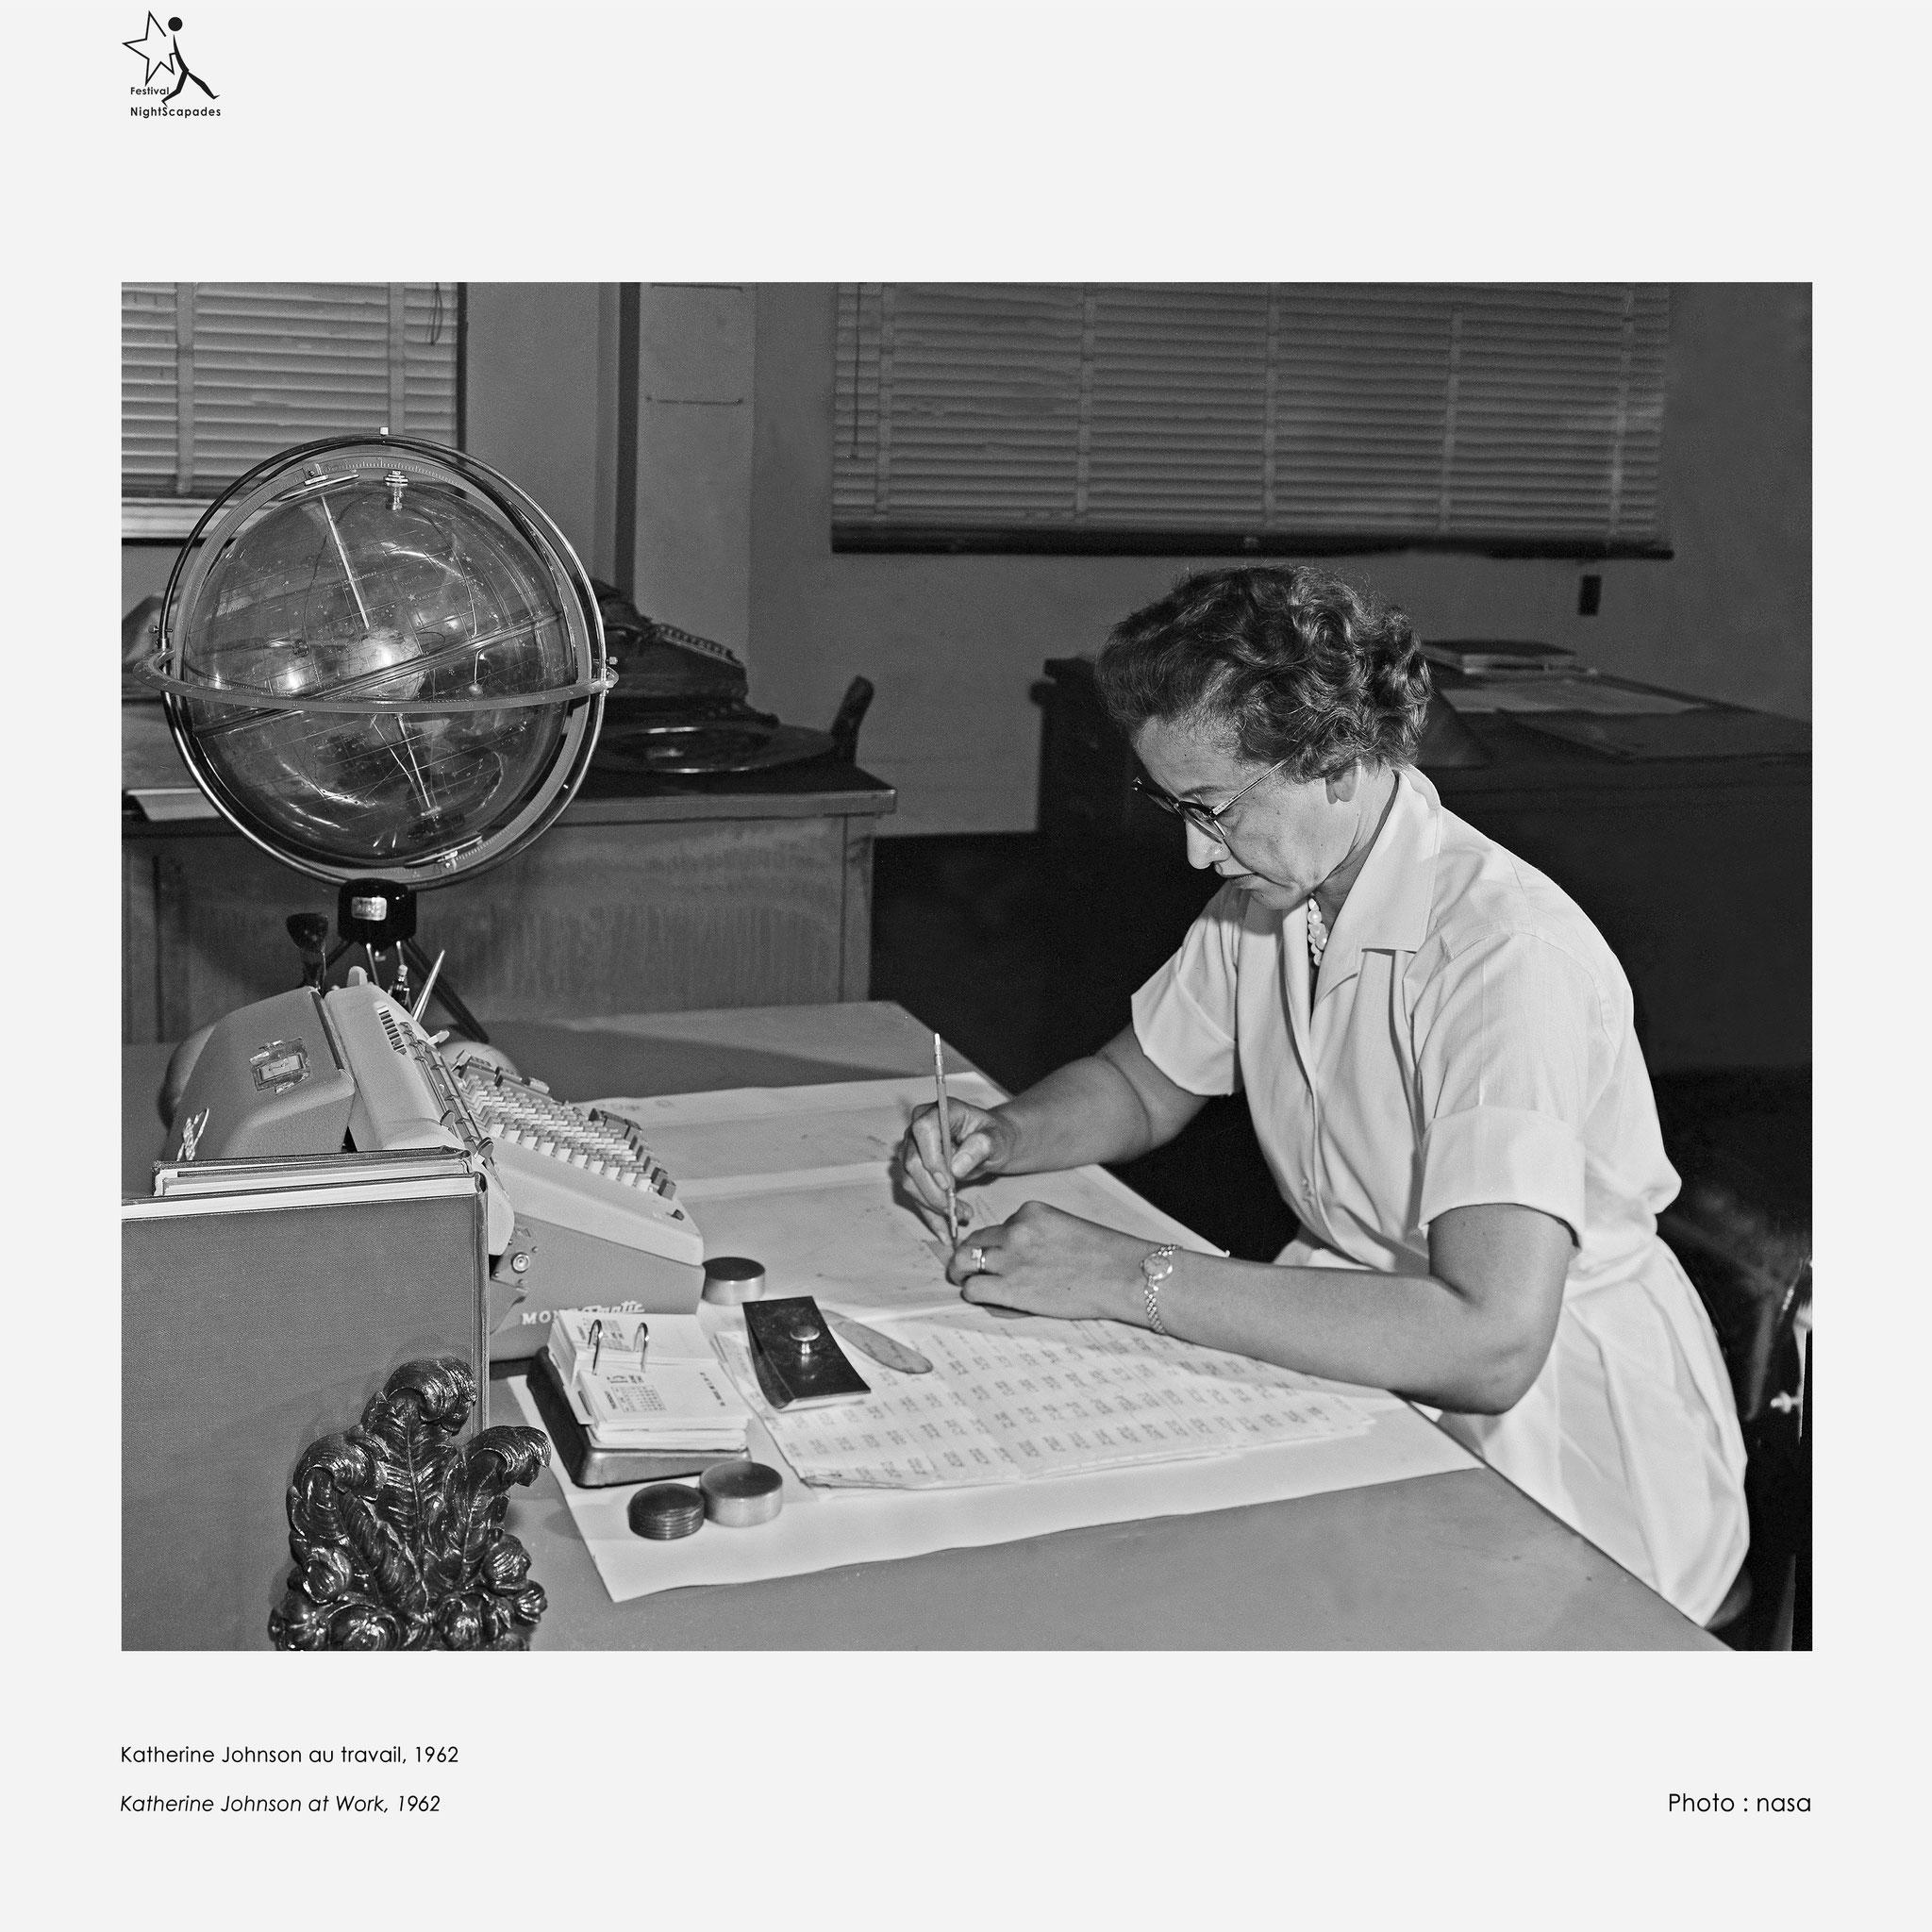 Katherine Johnson au travail, 1962